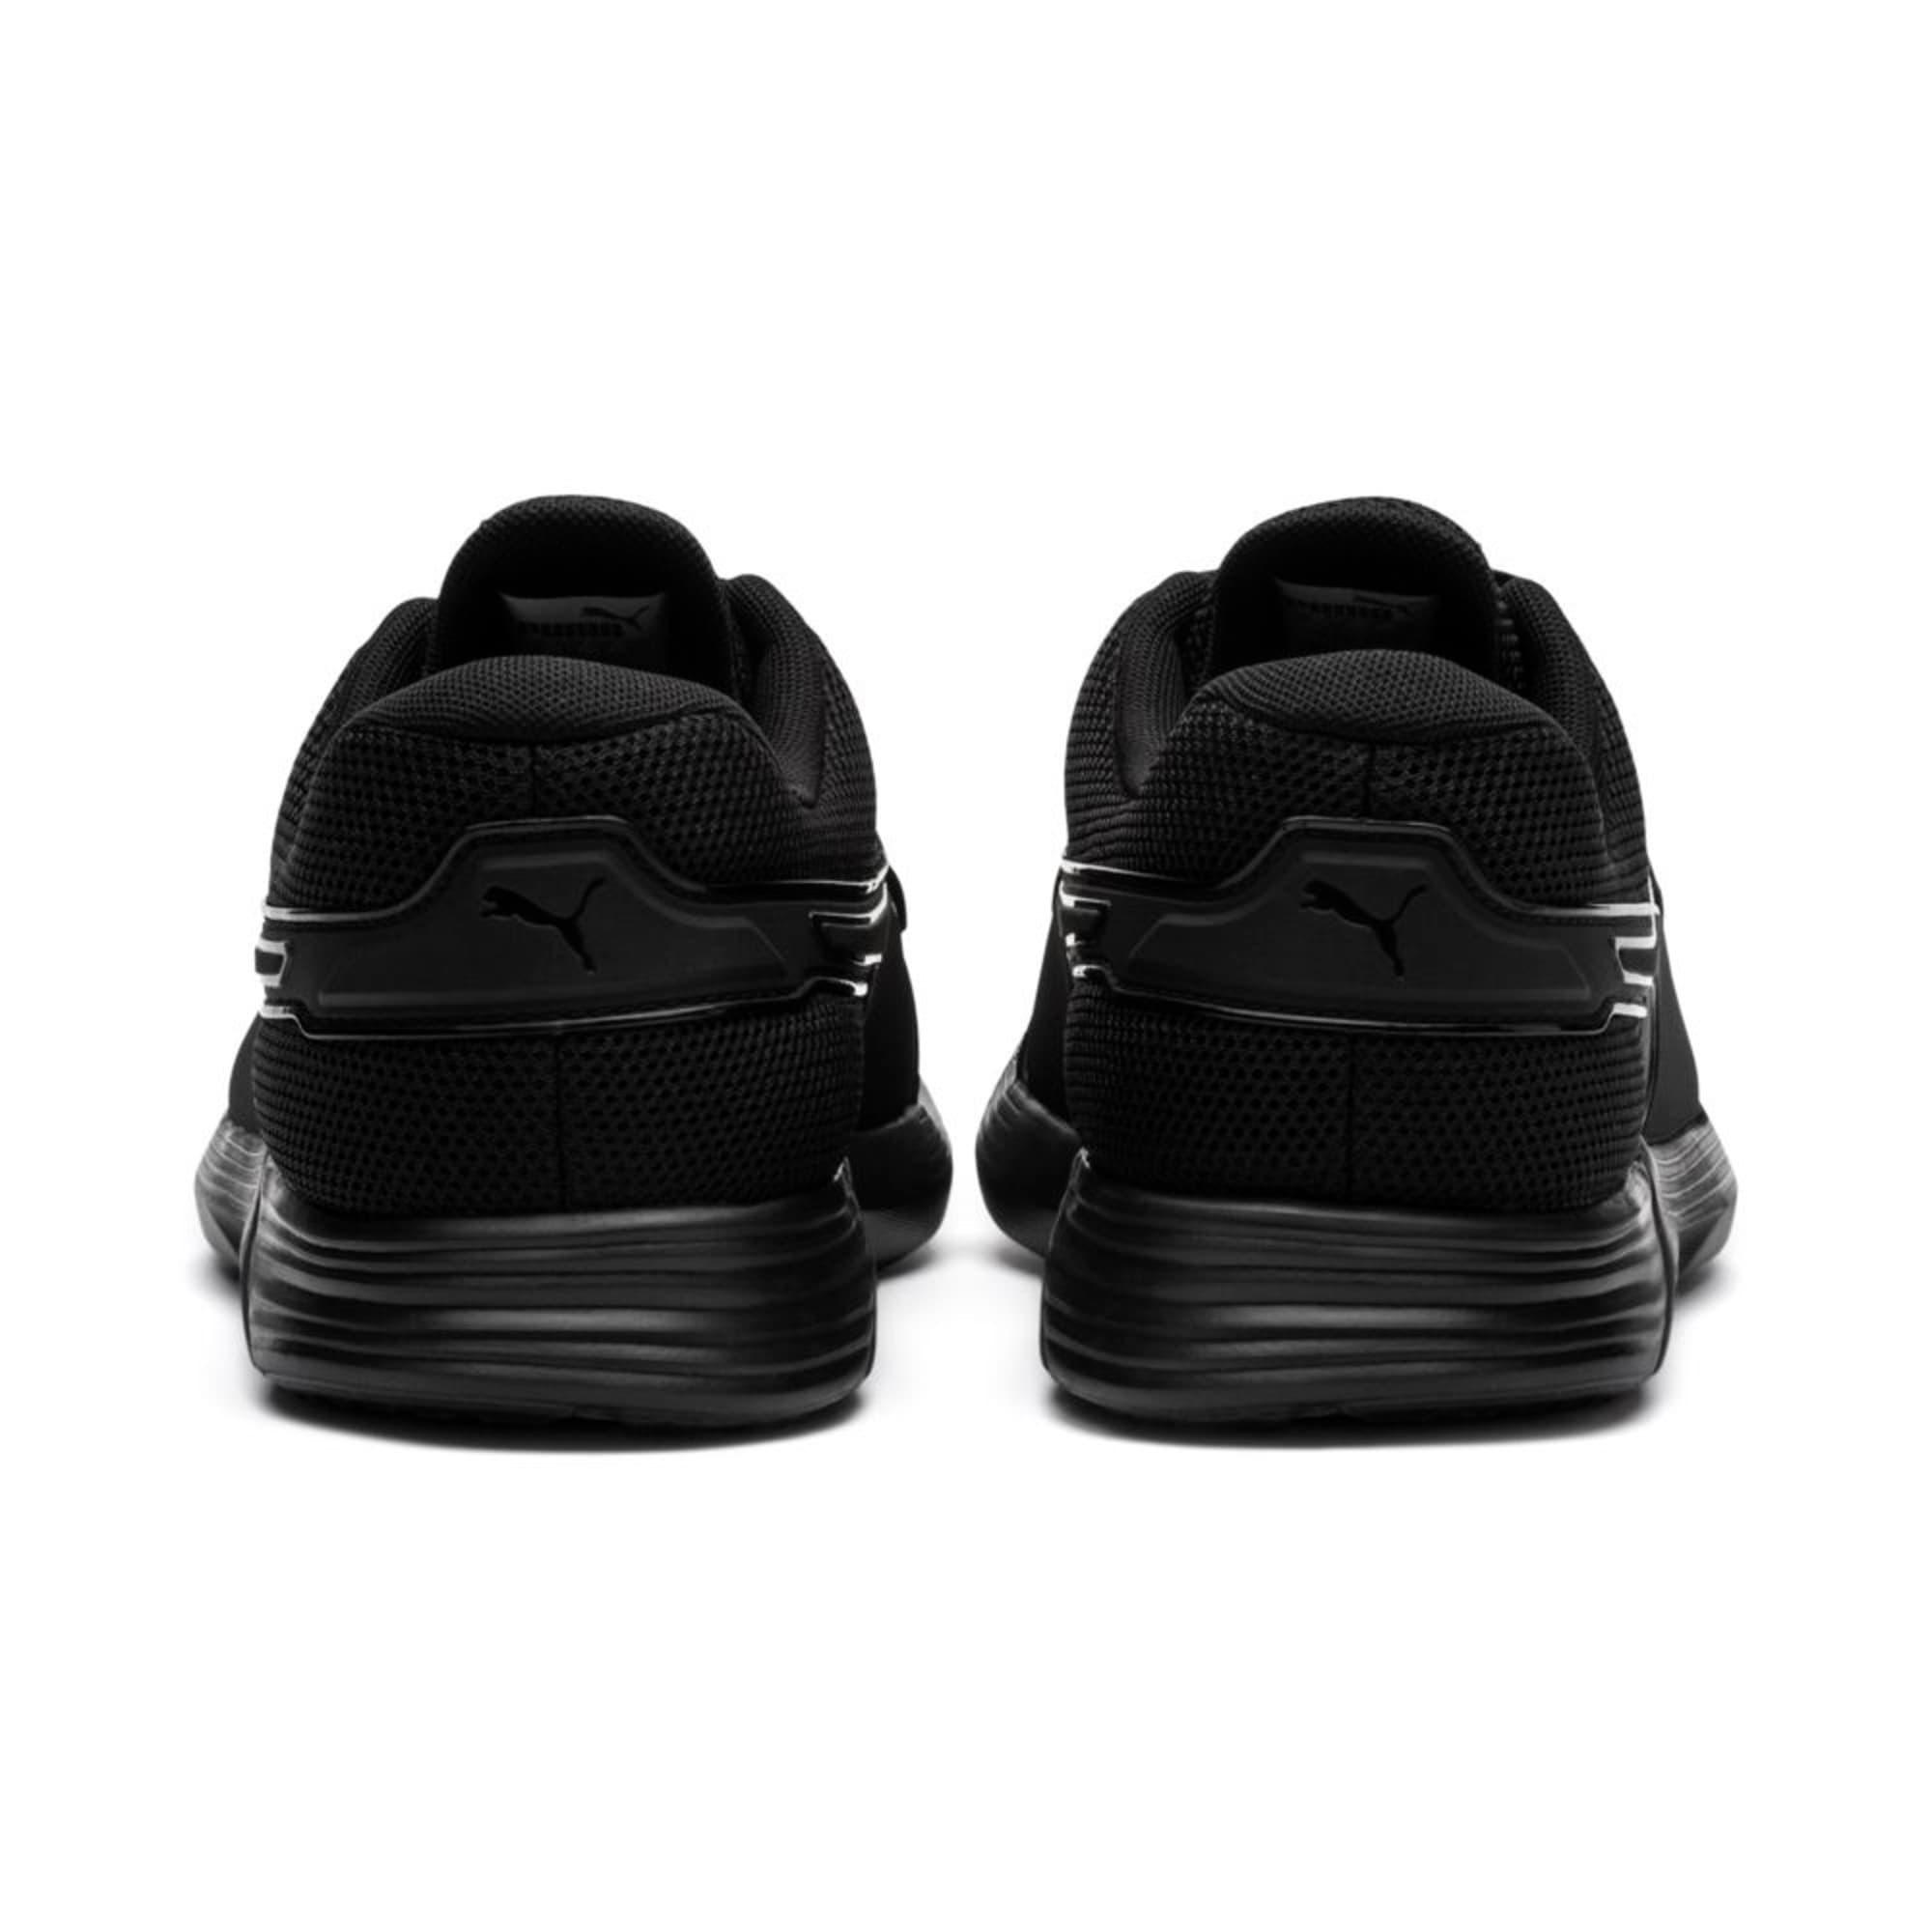 Thumbnail 4 of Propel XT Men's Training Shoes, Puma Black-Strong Blue, medium-IND